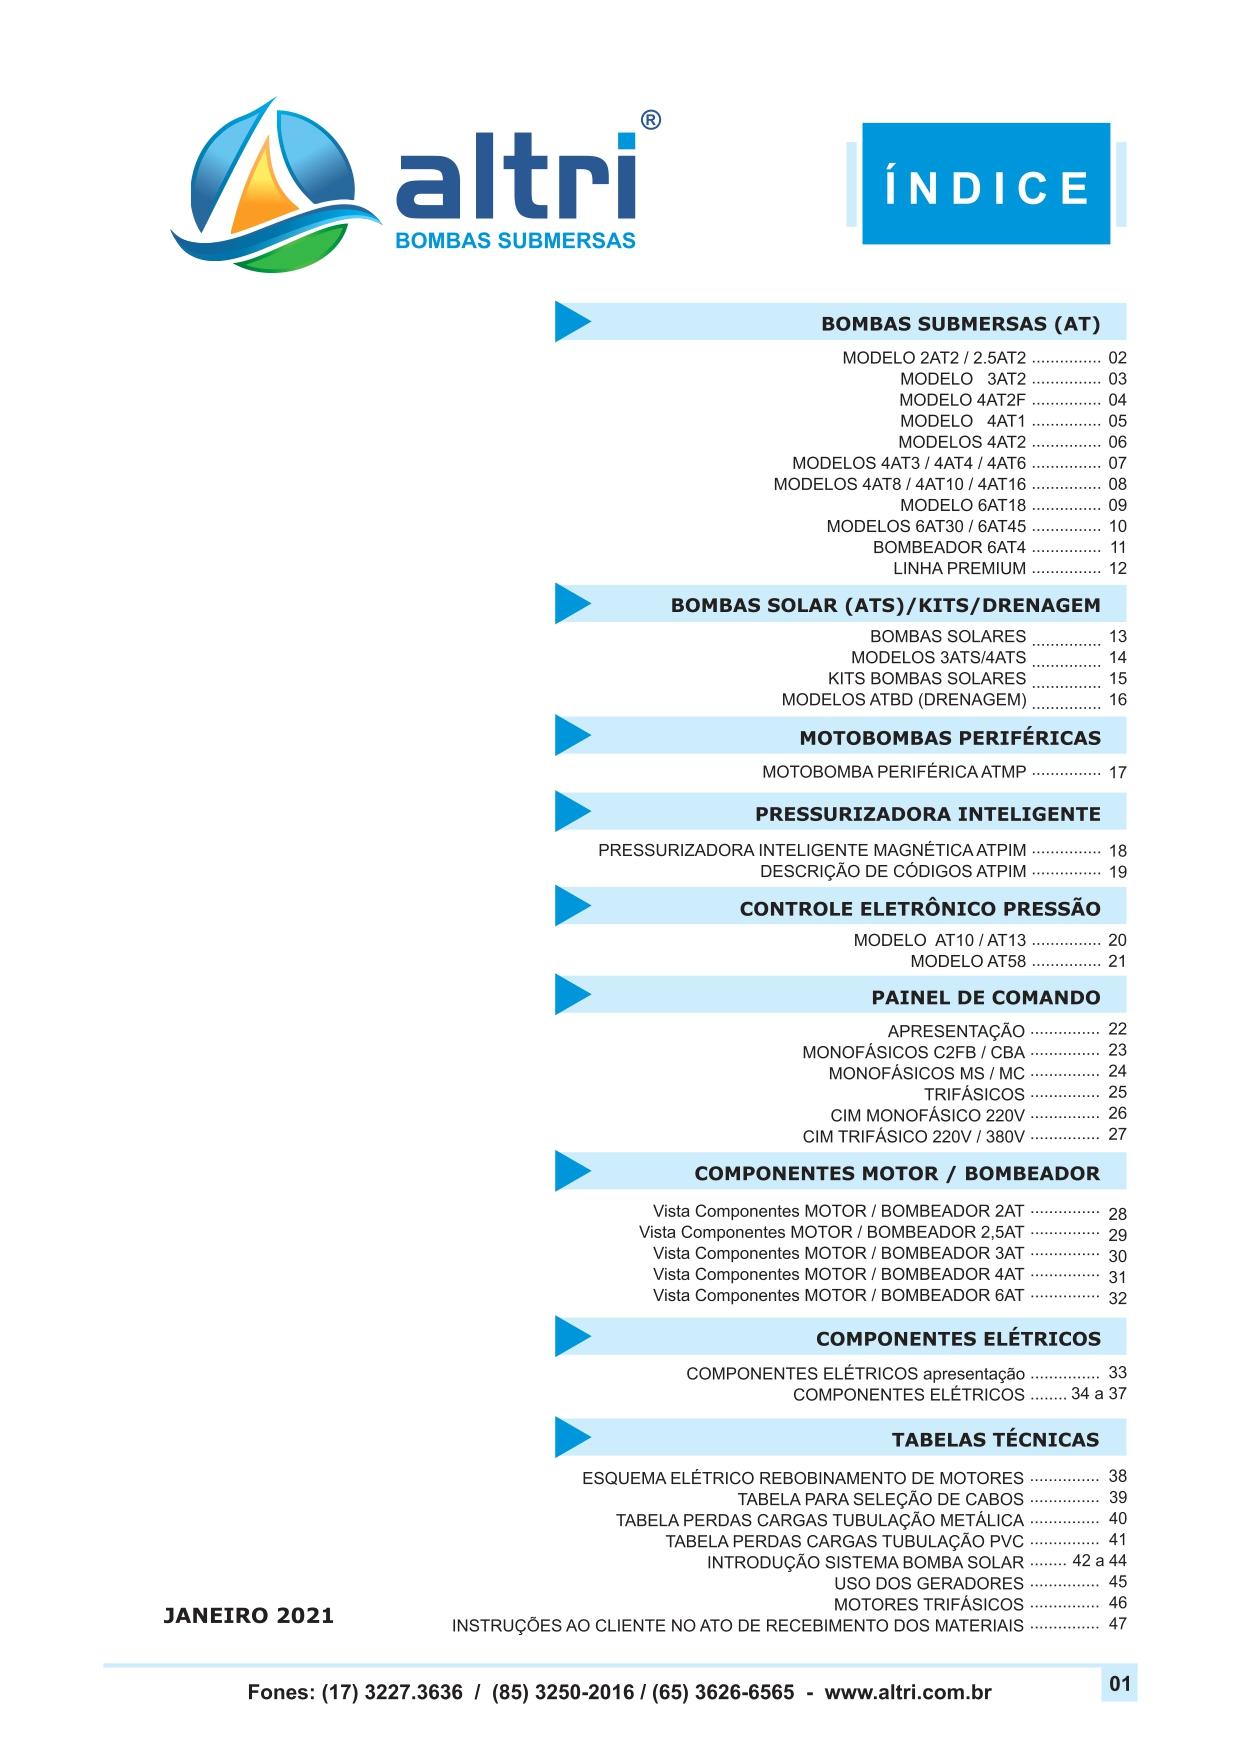 CATALOGO DE PRODUTOS ALTRI 2021 - WEB_page-0003